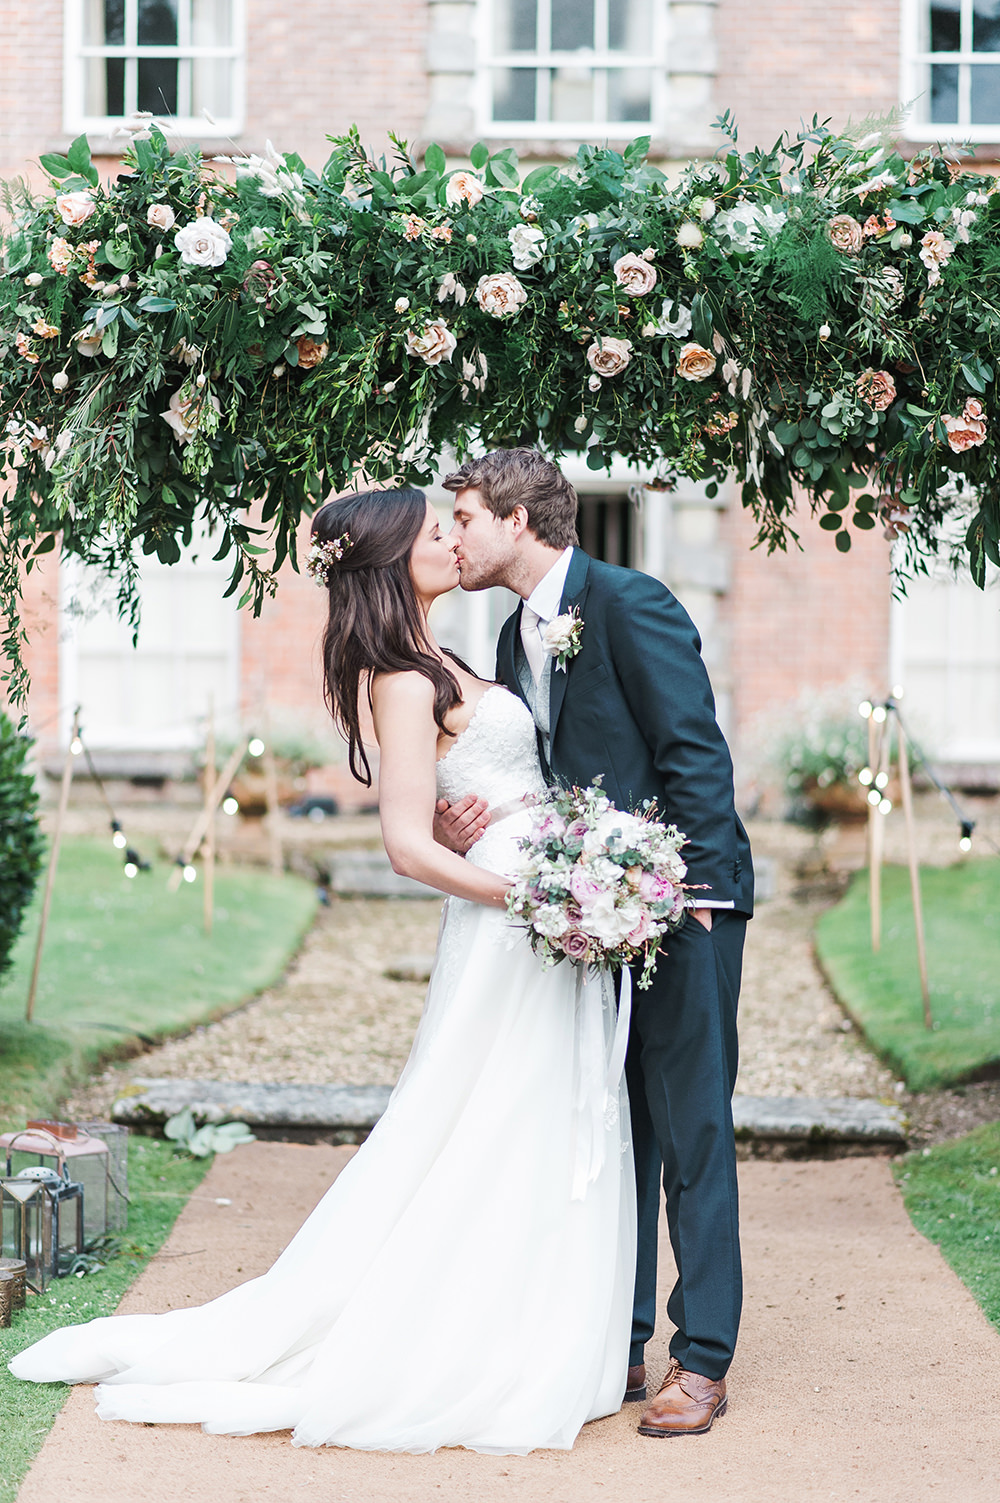 Bride Bridal Gown Dress Strapless Sweetheart Neckline Ribbon Belt Pink Blue Suit Groom Floral Foliage Arch Edmondsham House Wedding Darima Frampton Photography